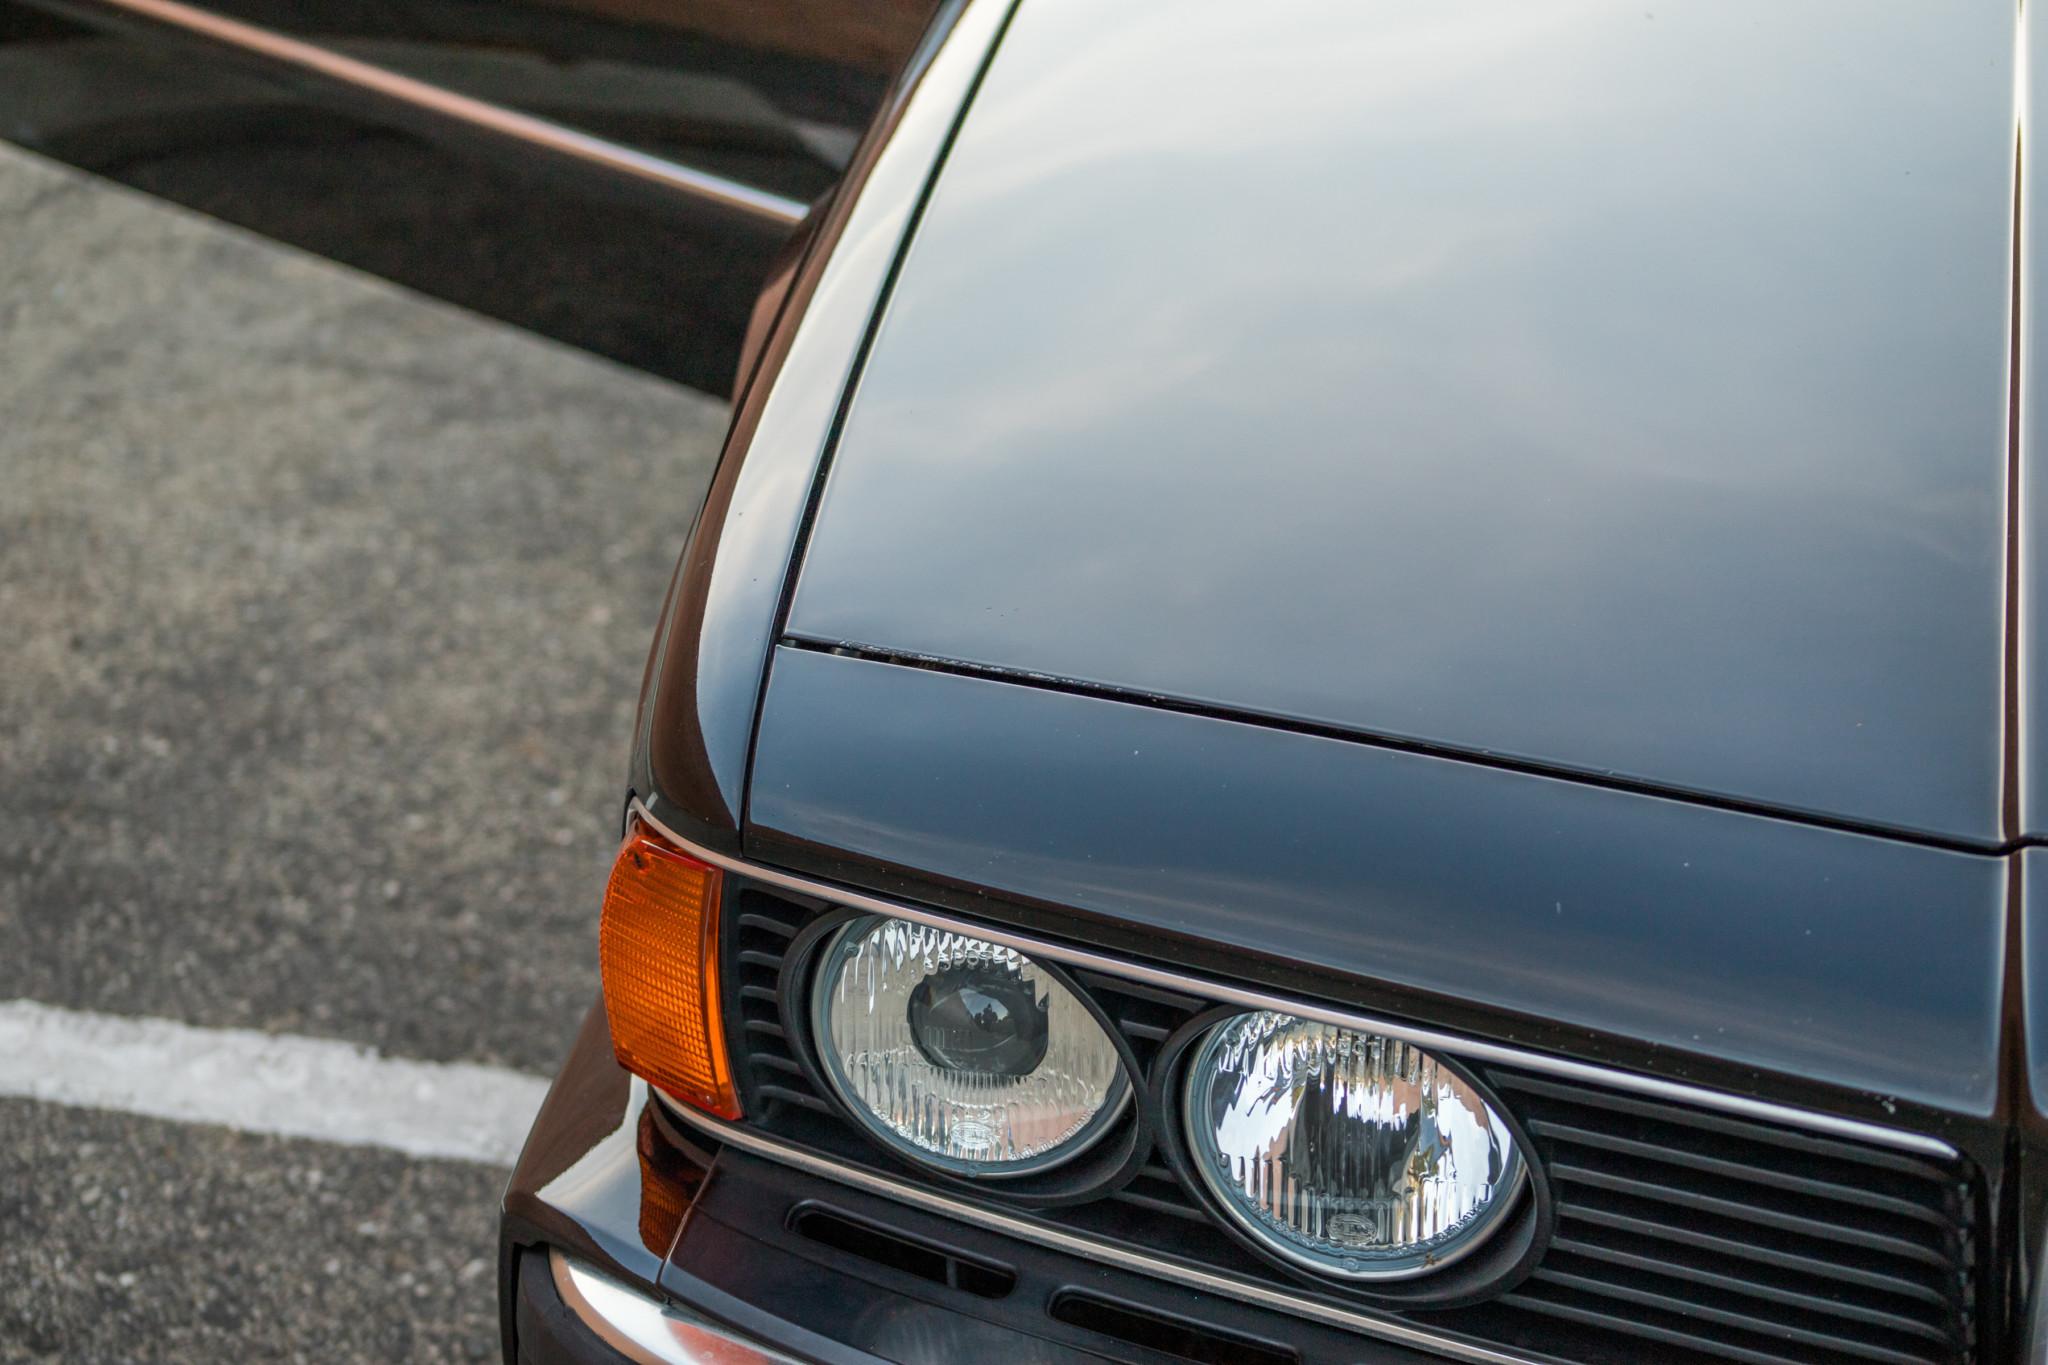 1988 bmw M6 kent classic cars (21).jpg